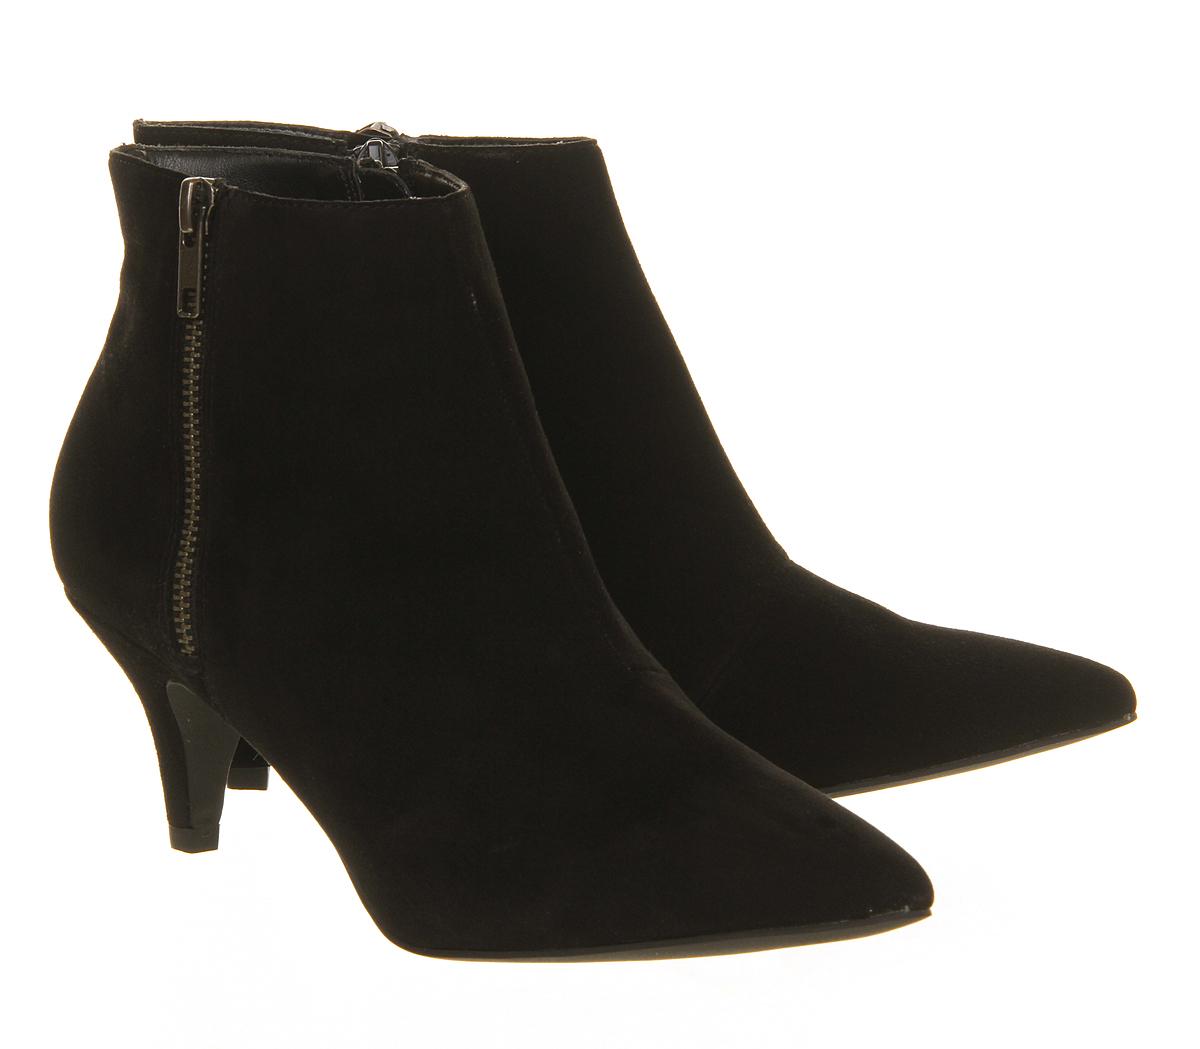 Office Go Go Kitten Heel Shoe Boots in Black   Lyst